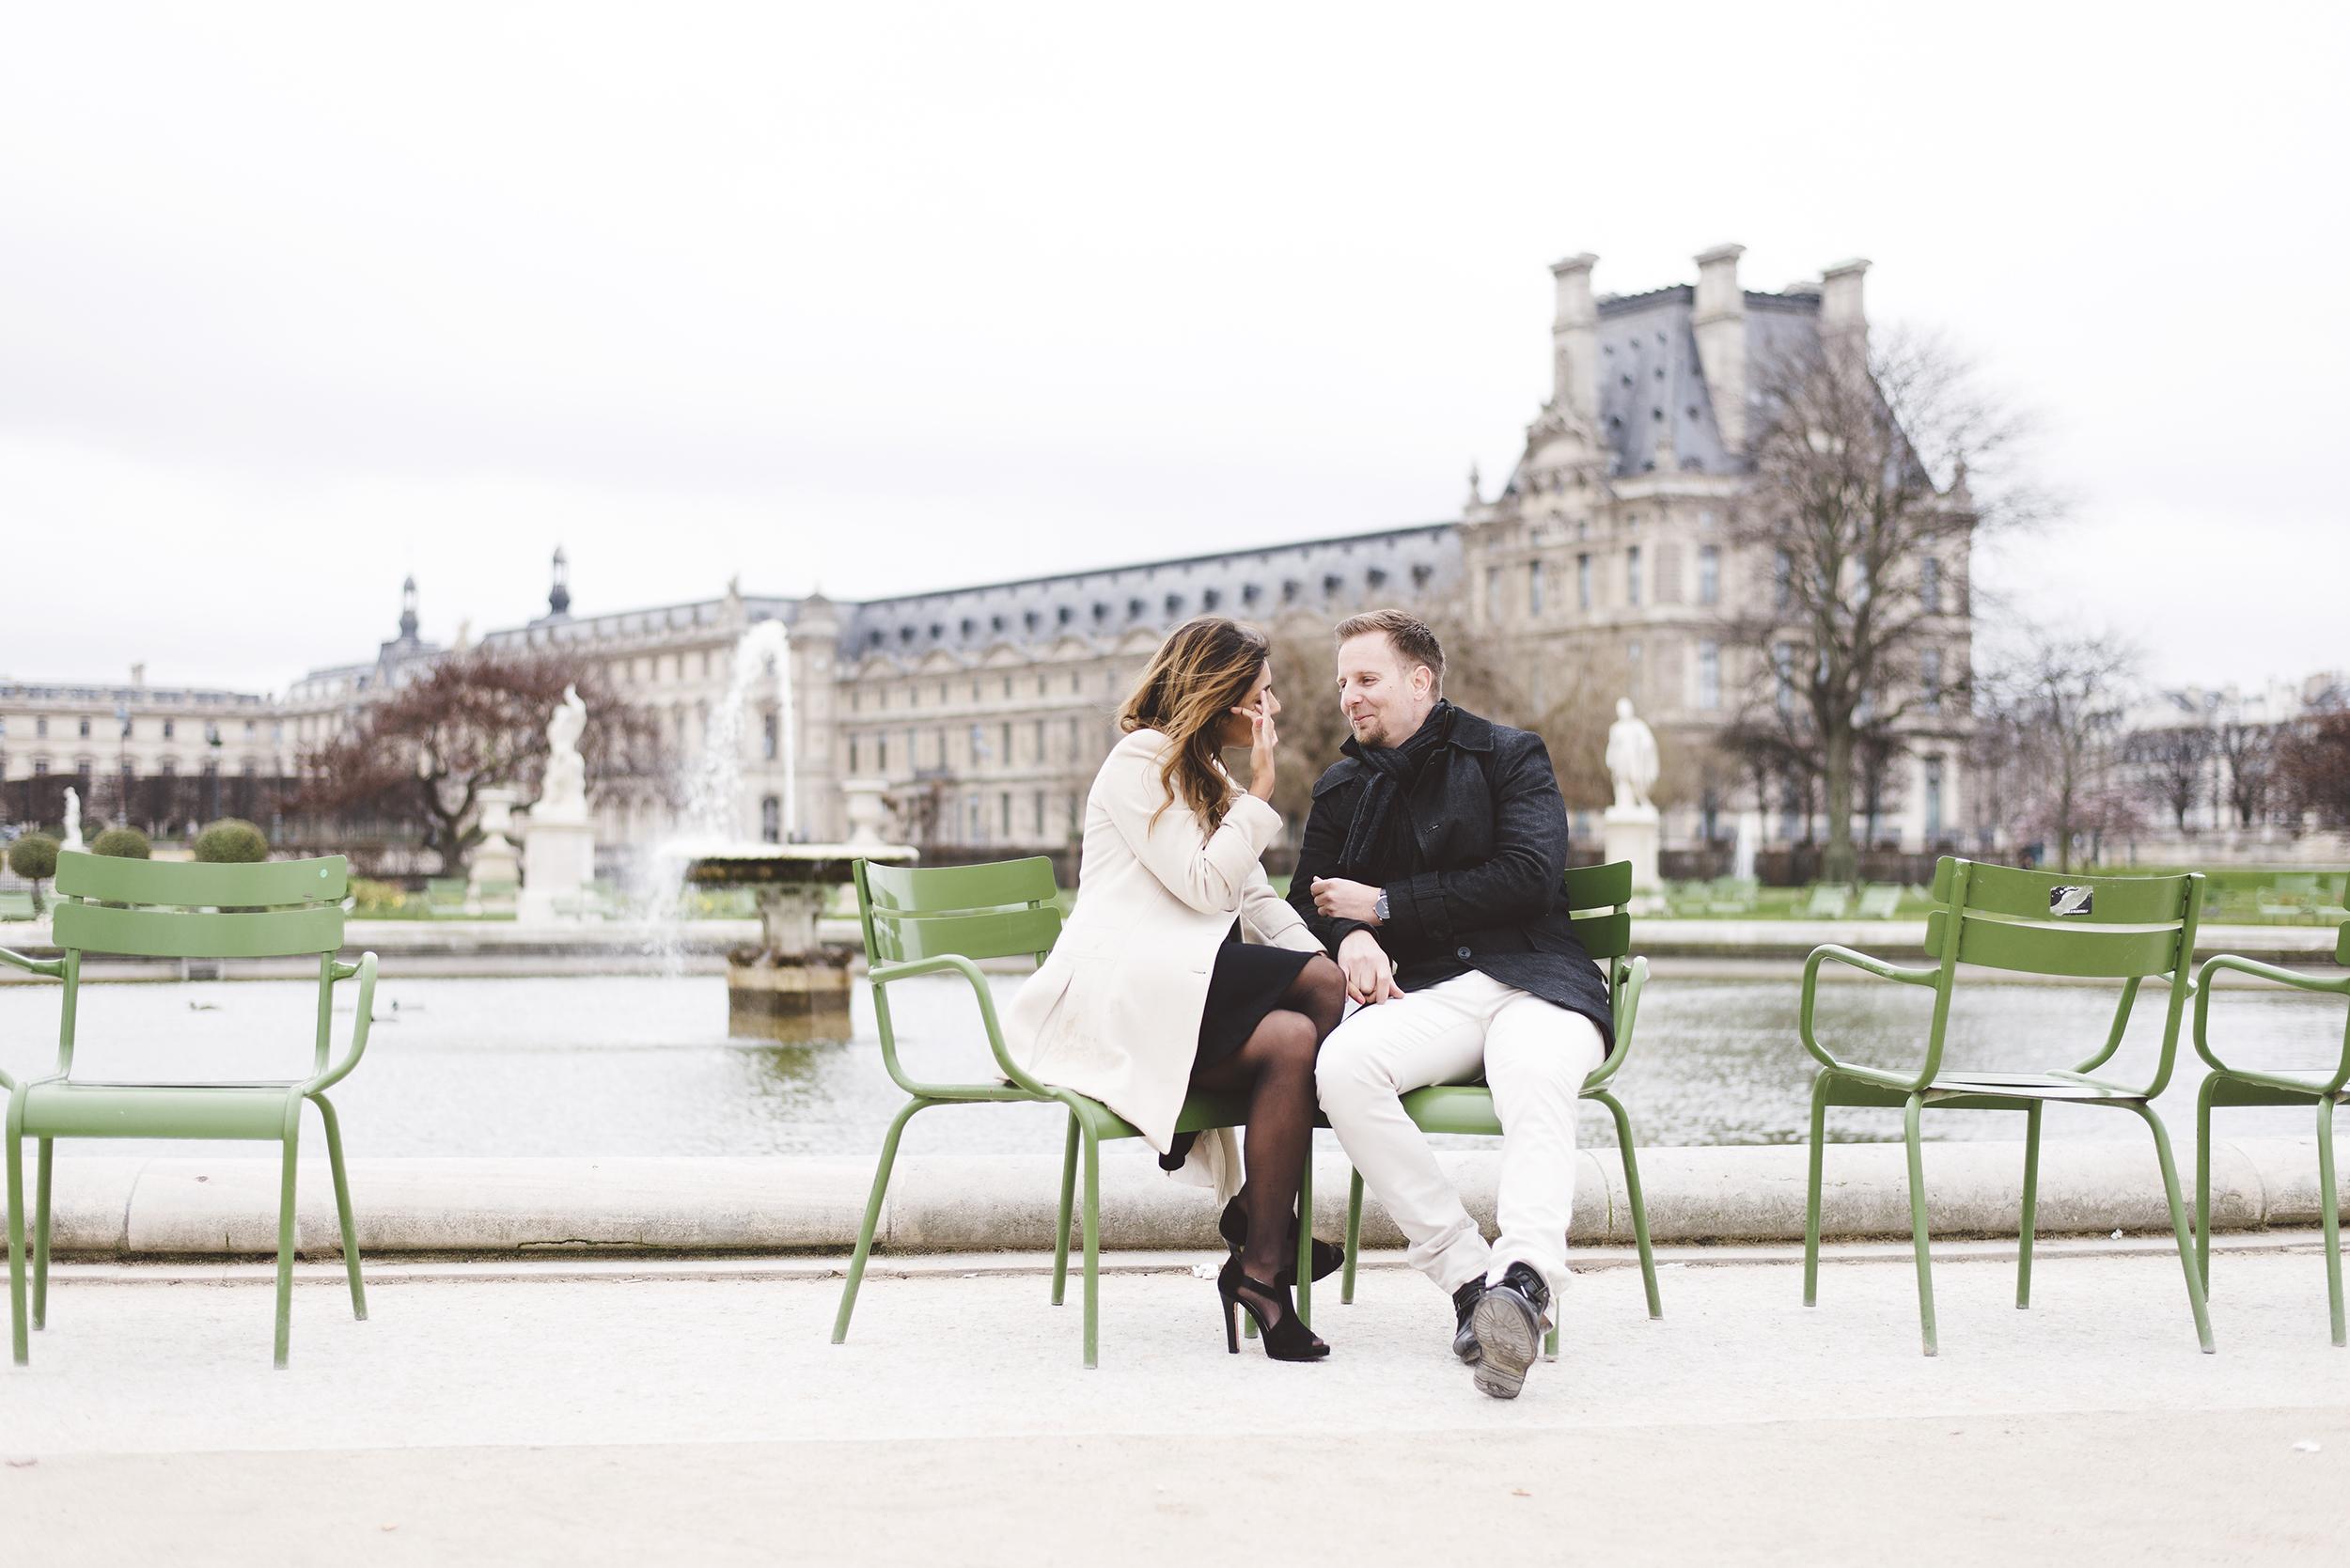 Couple-photoshoot-Anniversary-Paris-Louvre-Tuileries002.jpg